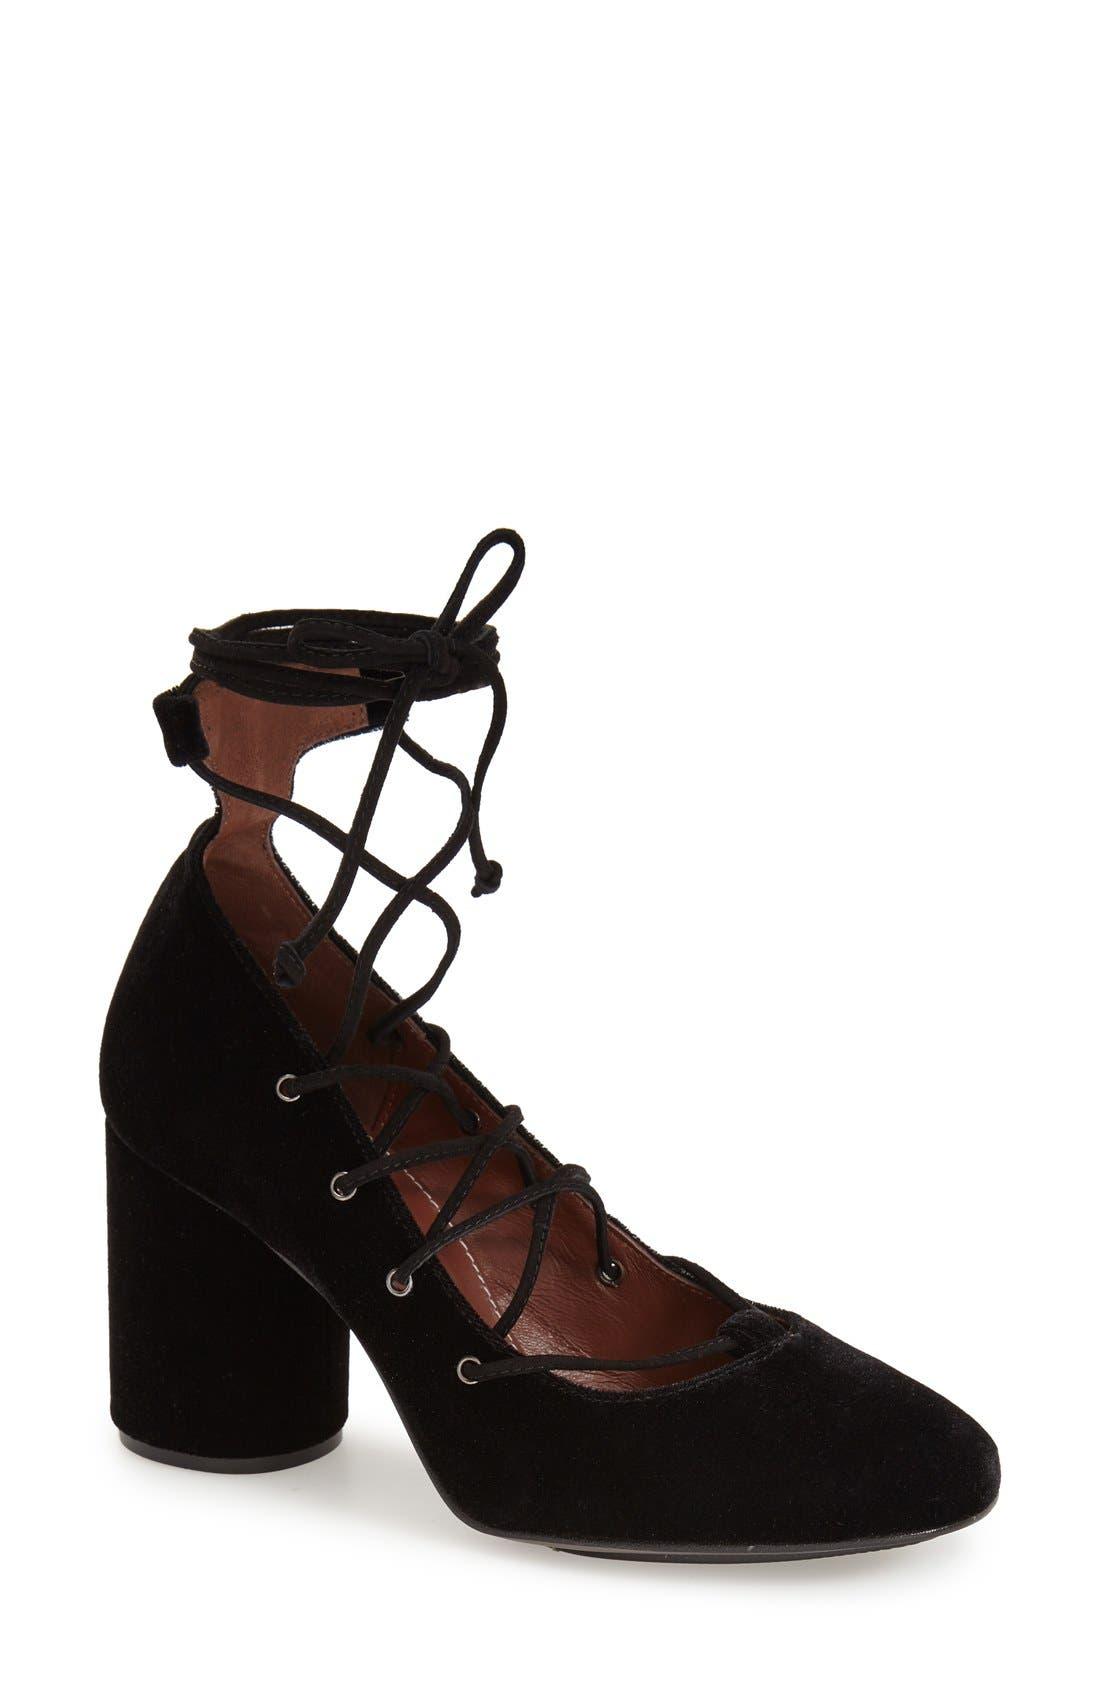 Main Image - Topshop'Prize Tie' Ghillie Pump (Women)